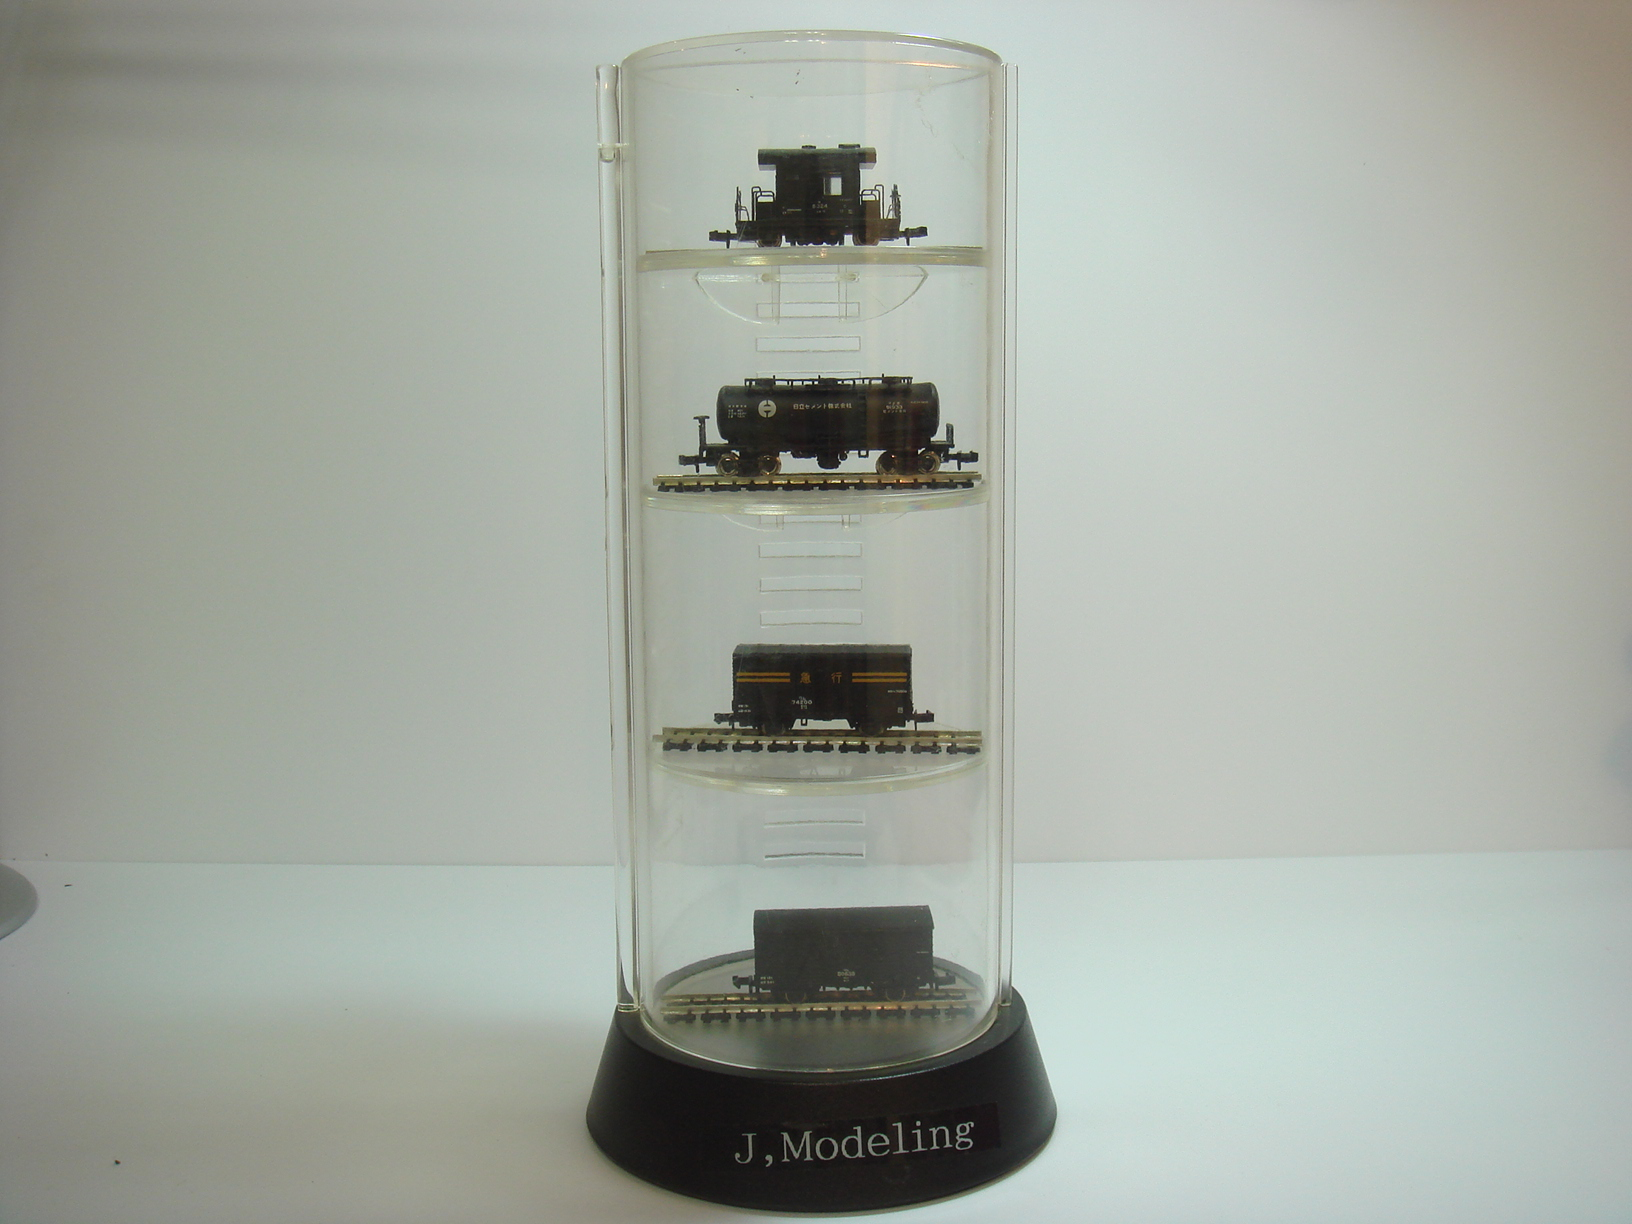 Sコレクションケース::1872【バッグ・小物・ブランド雑貨】記念日向けギフトの通販サイト「バースデープレス」